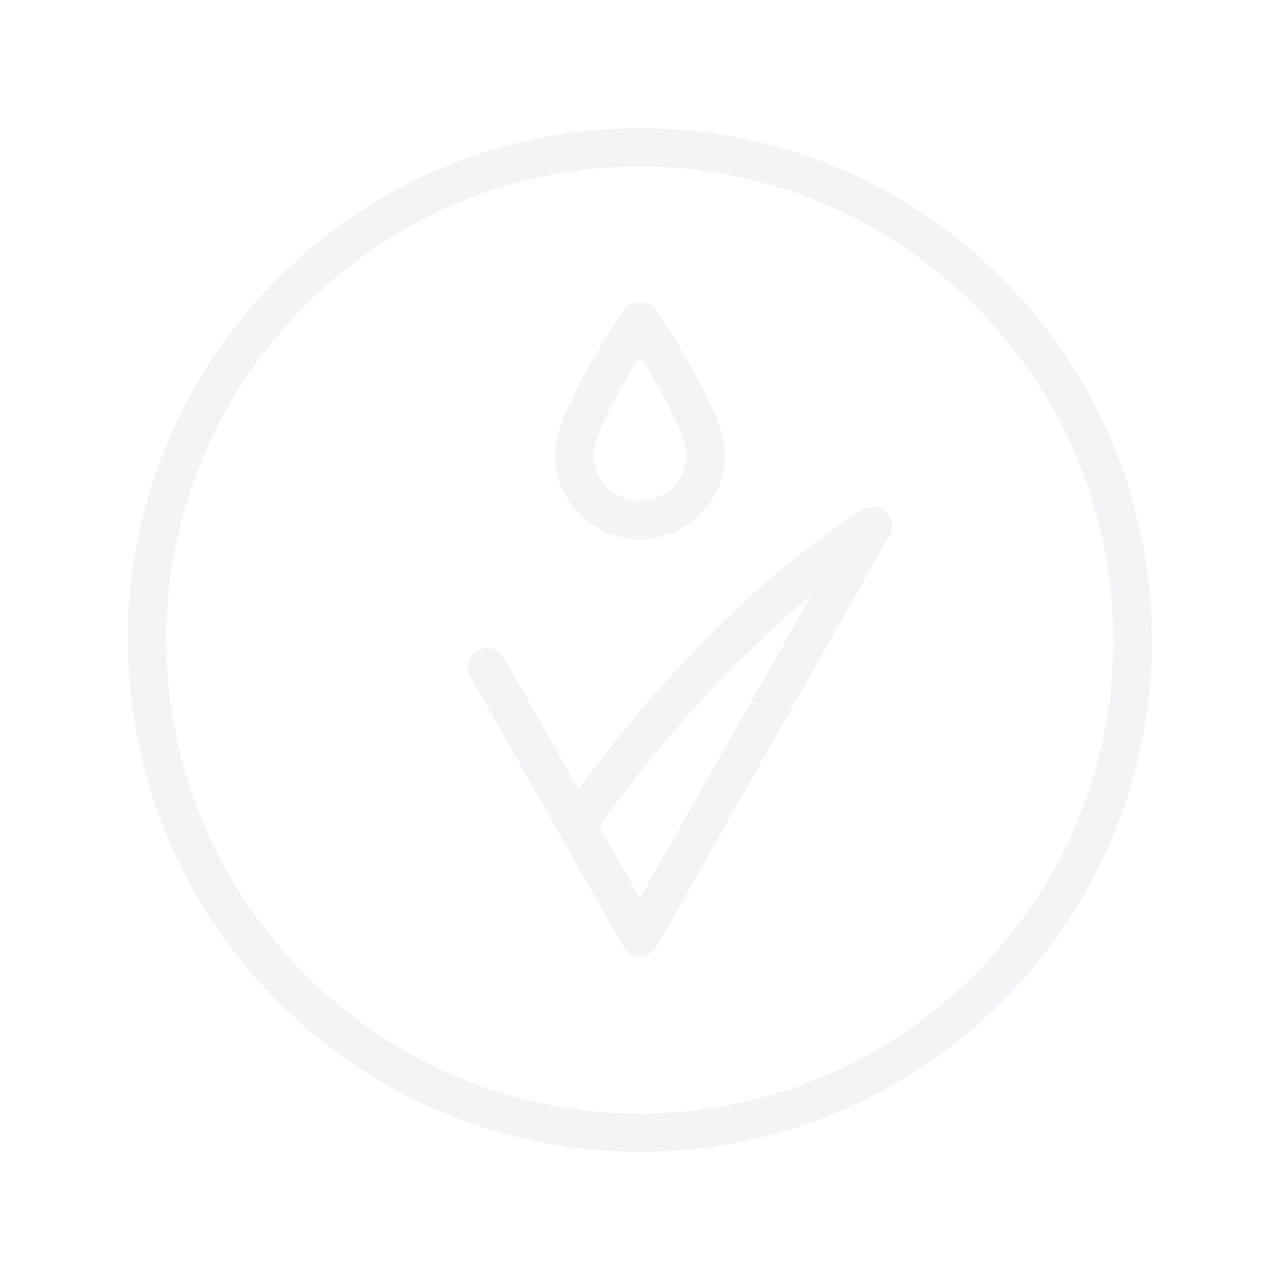 DIOR Diorskin Forever & Ever Control Loose Powder No.001 рассыпчатая пудра 8g